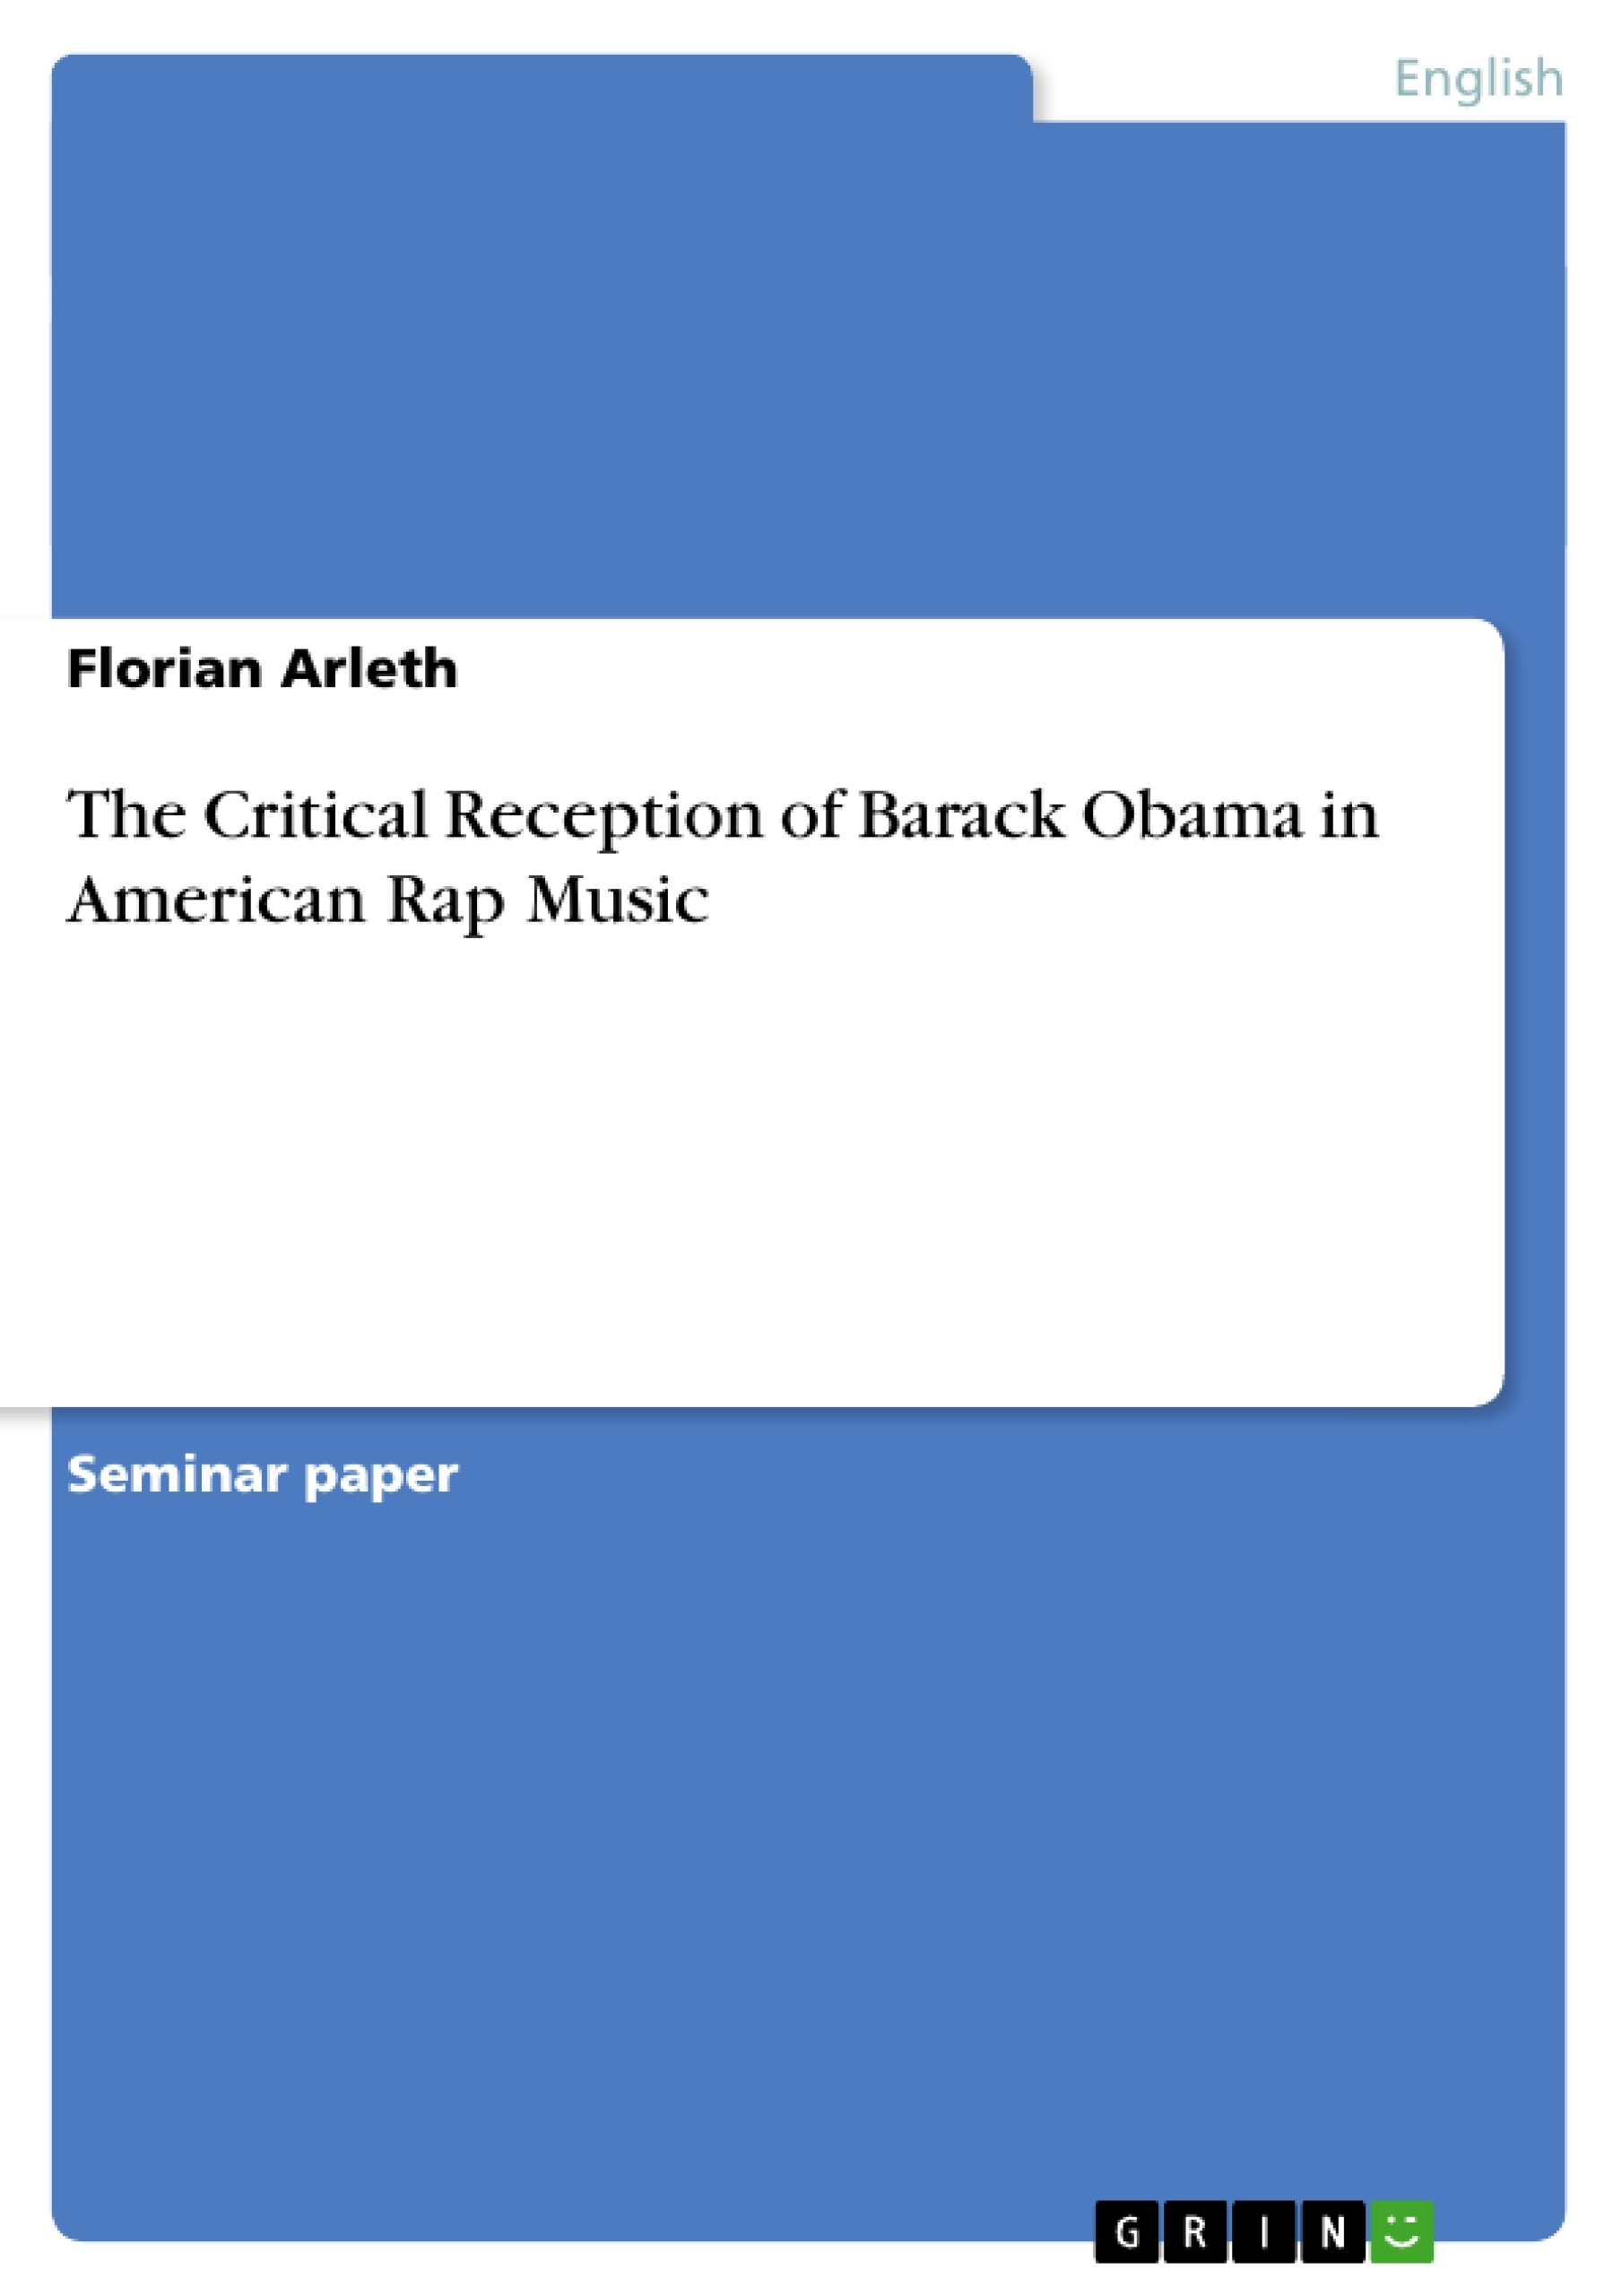 Title: The Critical Reception of Barack Obama in American Rap Music